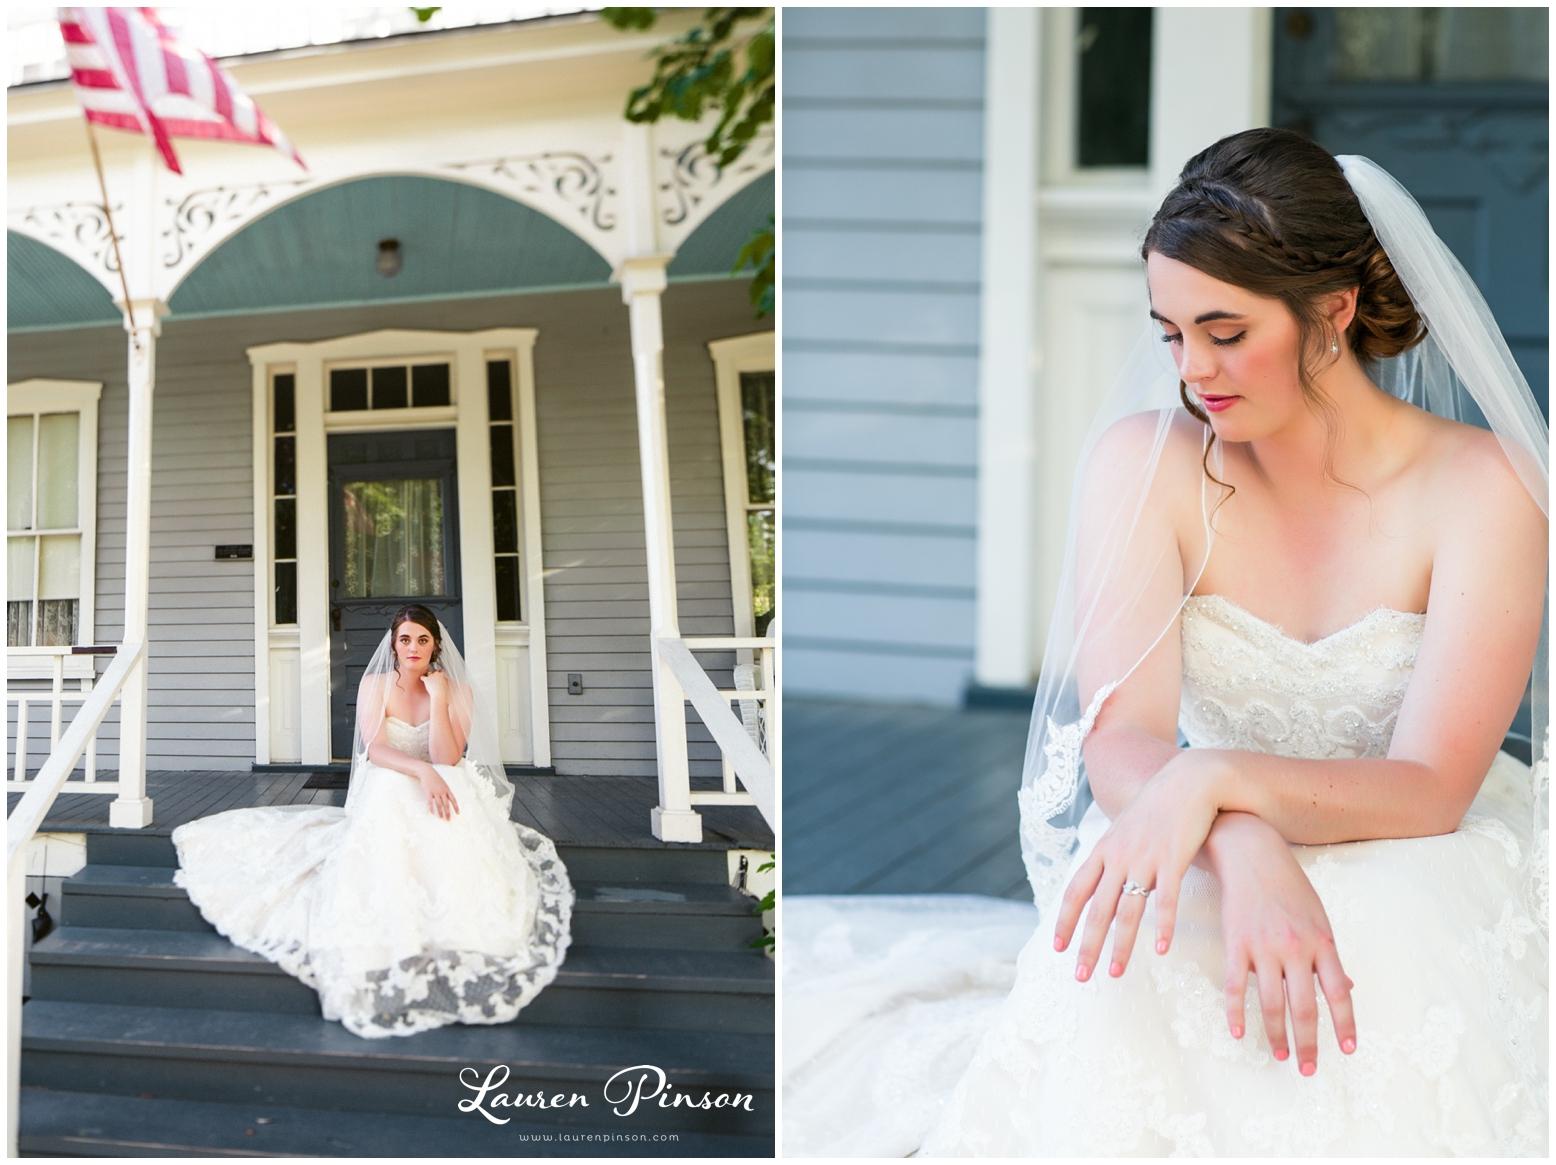 chestnut-square-downtown-mckinney-texas-wedding-photographer-sherman-northtexas-bridal-portraits-photography_0213.jpg